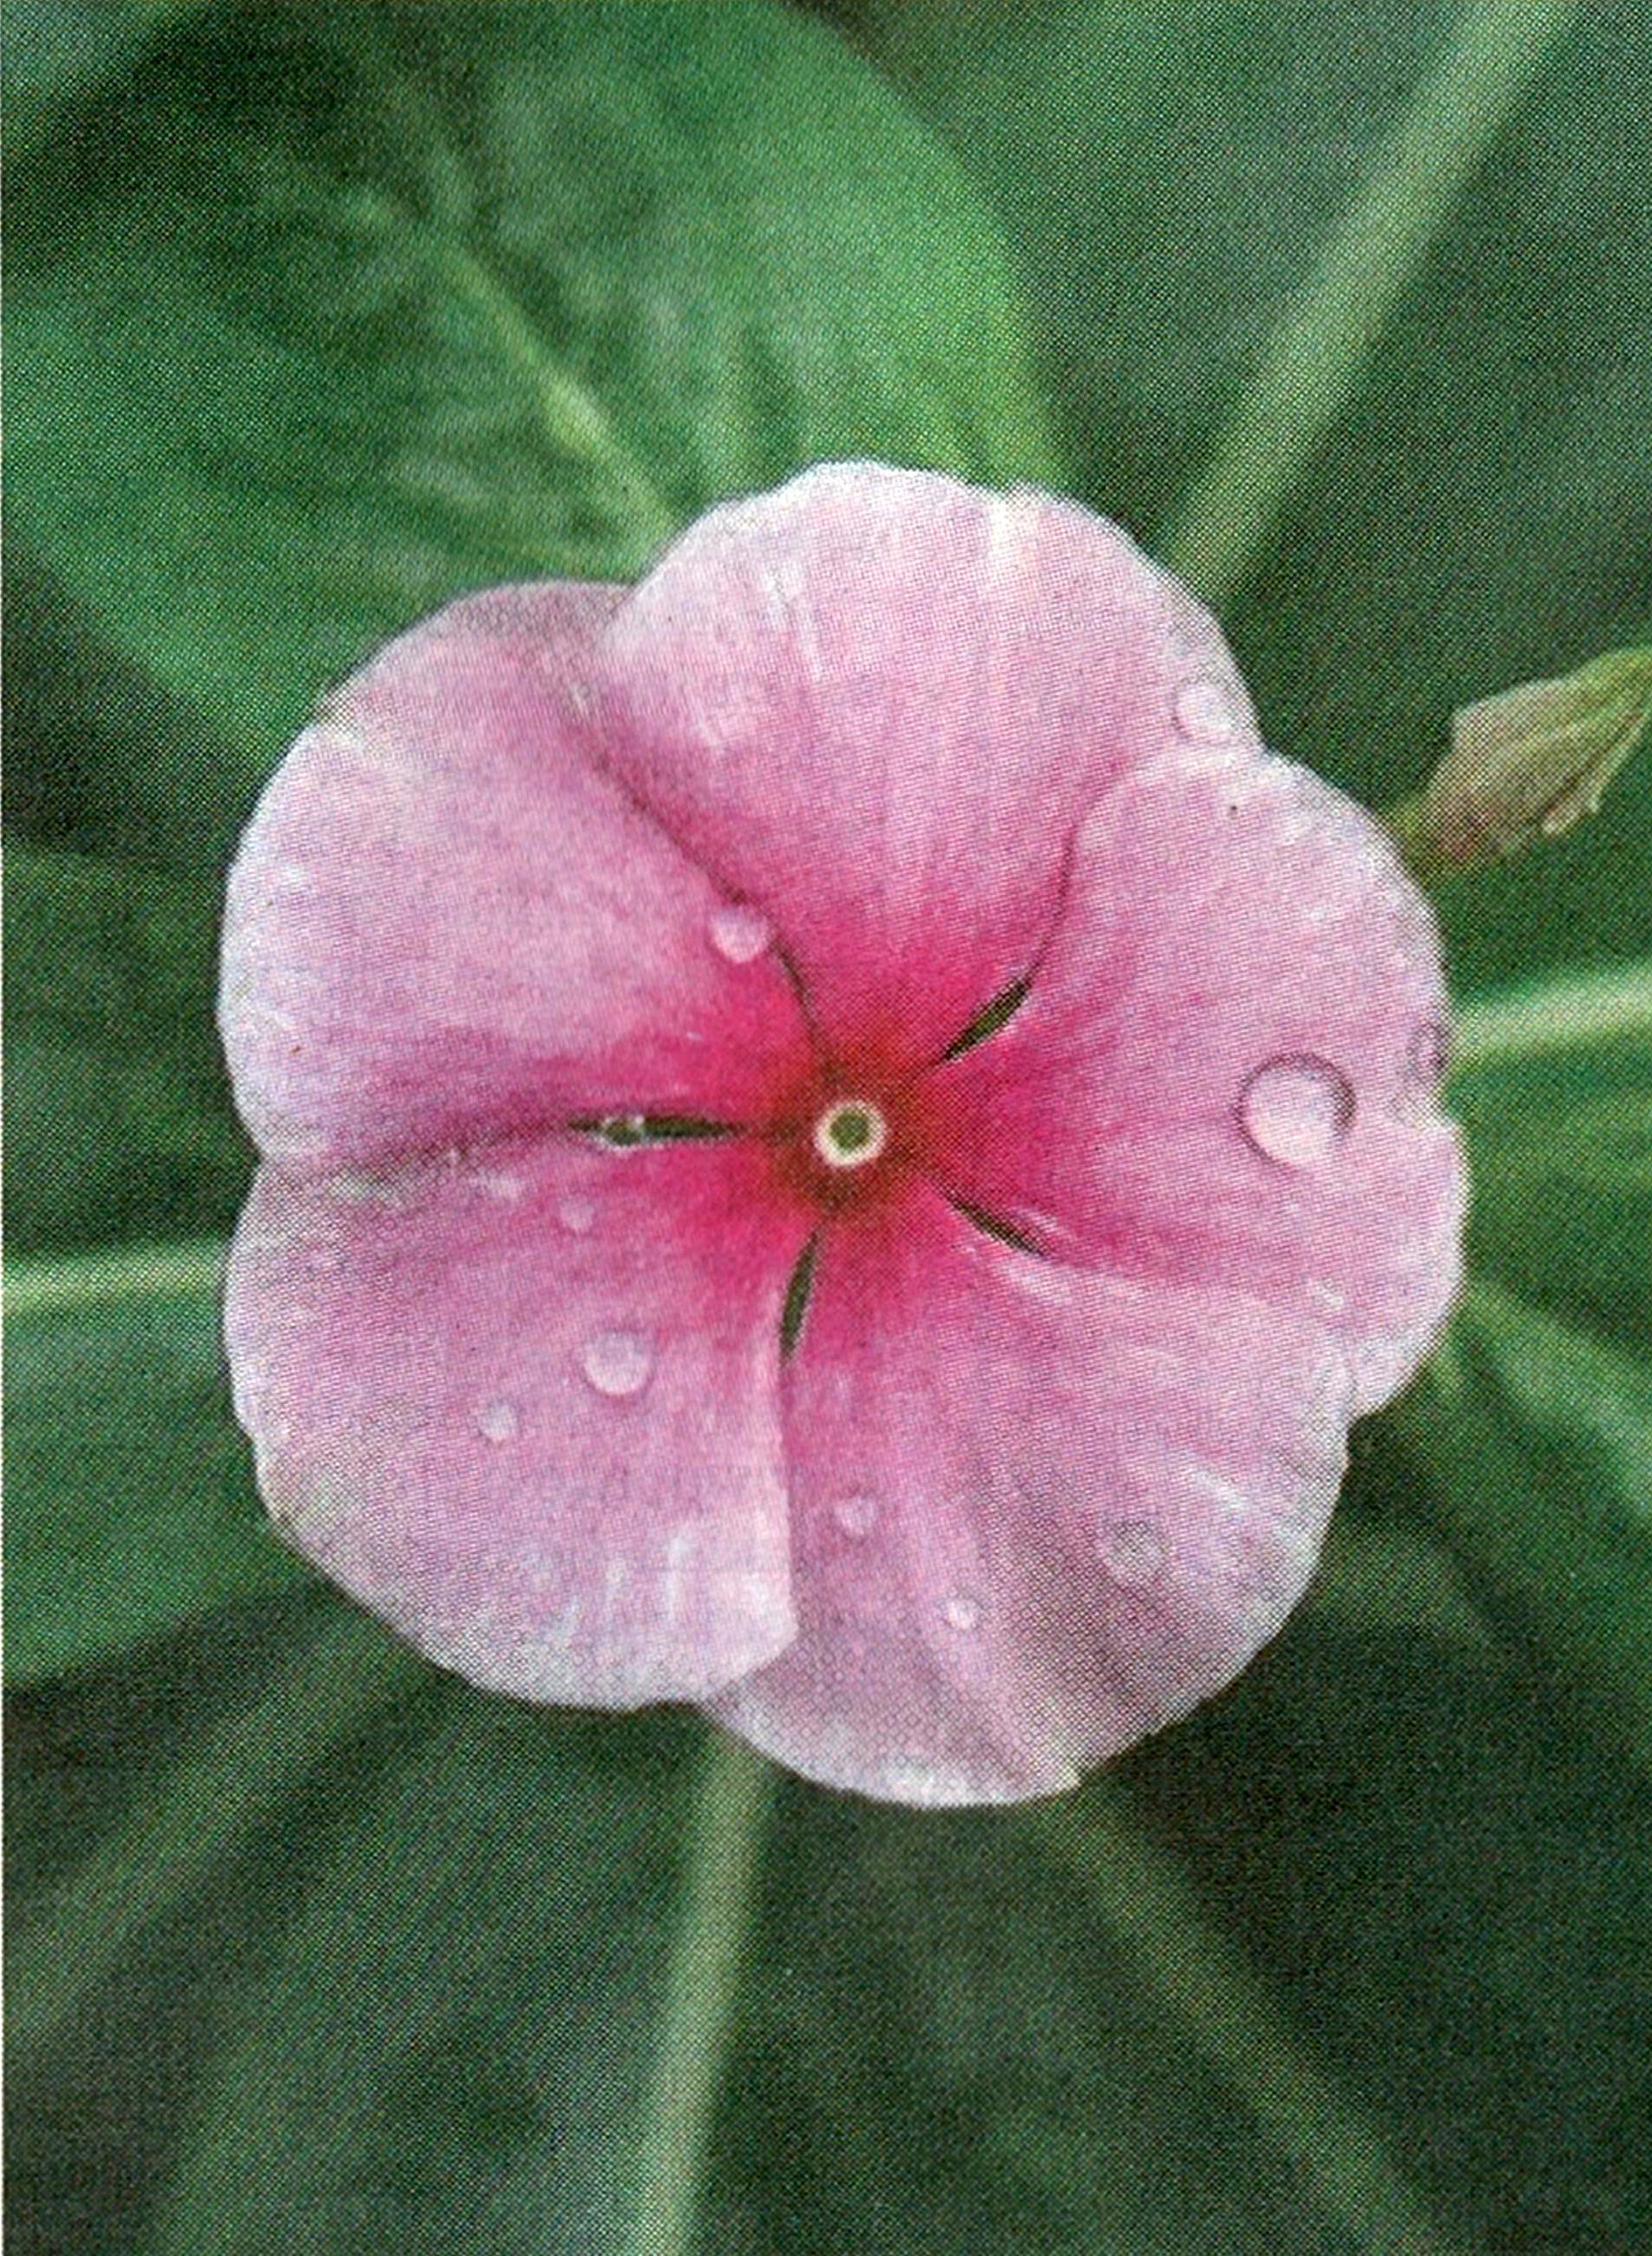 maagdepalm roze.jpg